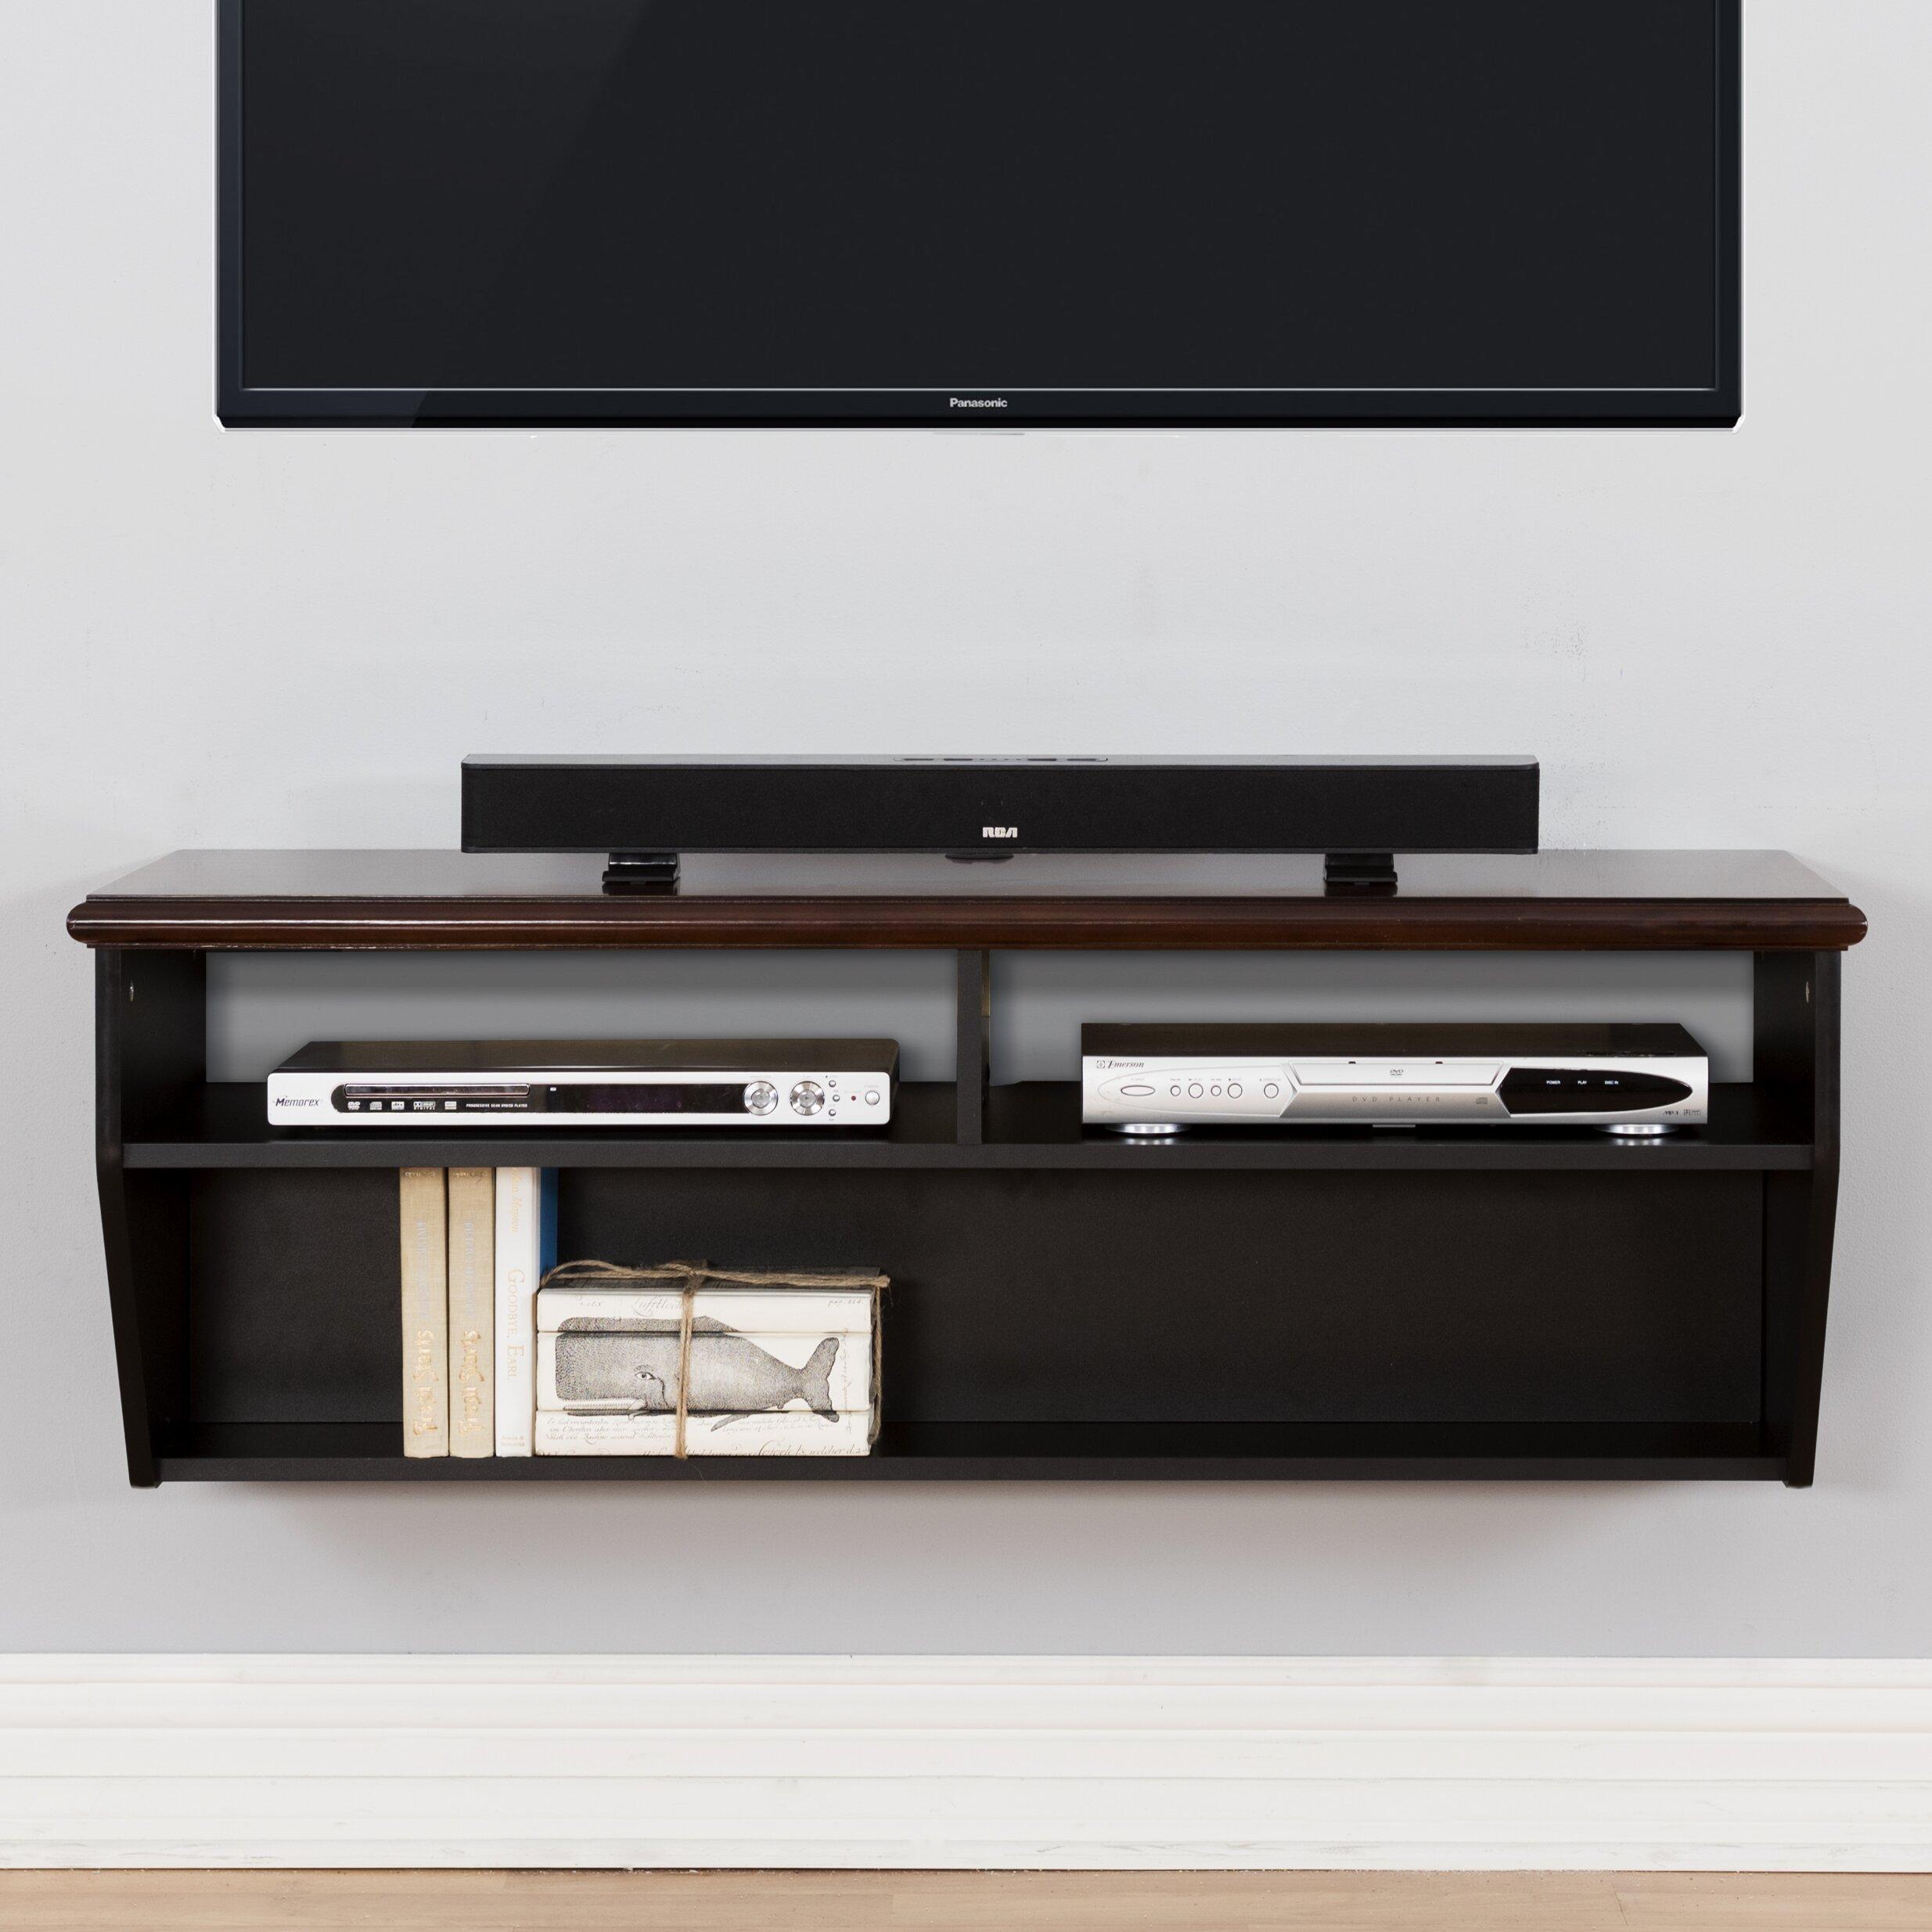 "Martin Home Furnishings 48"" Hardwood Veneer Top Wall"